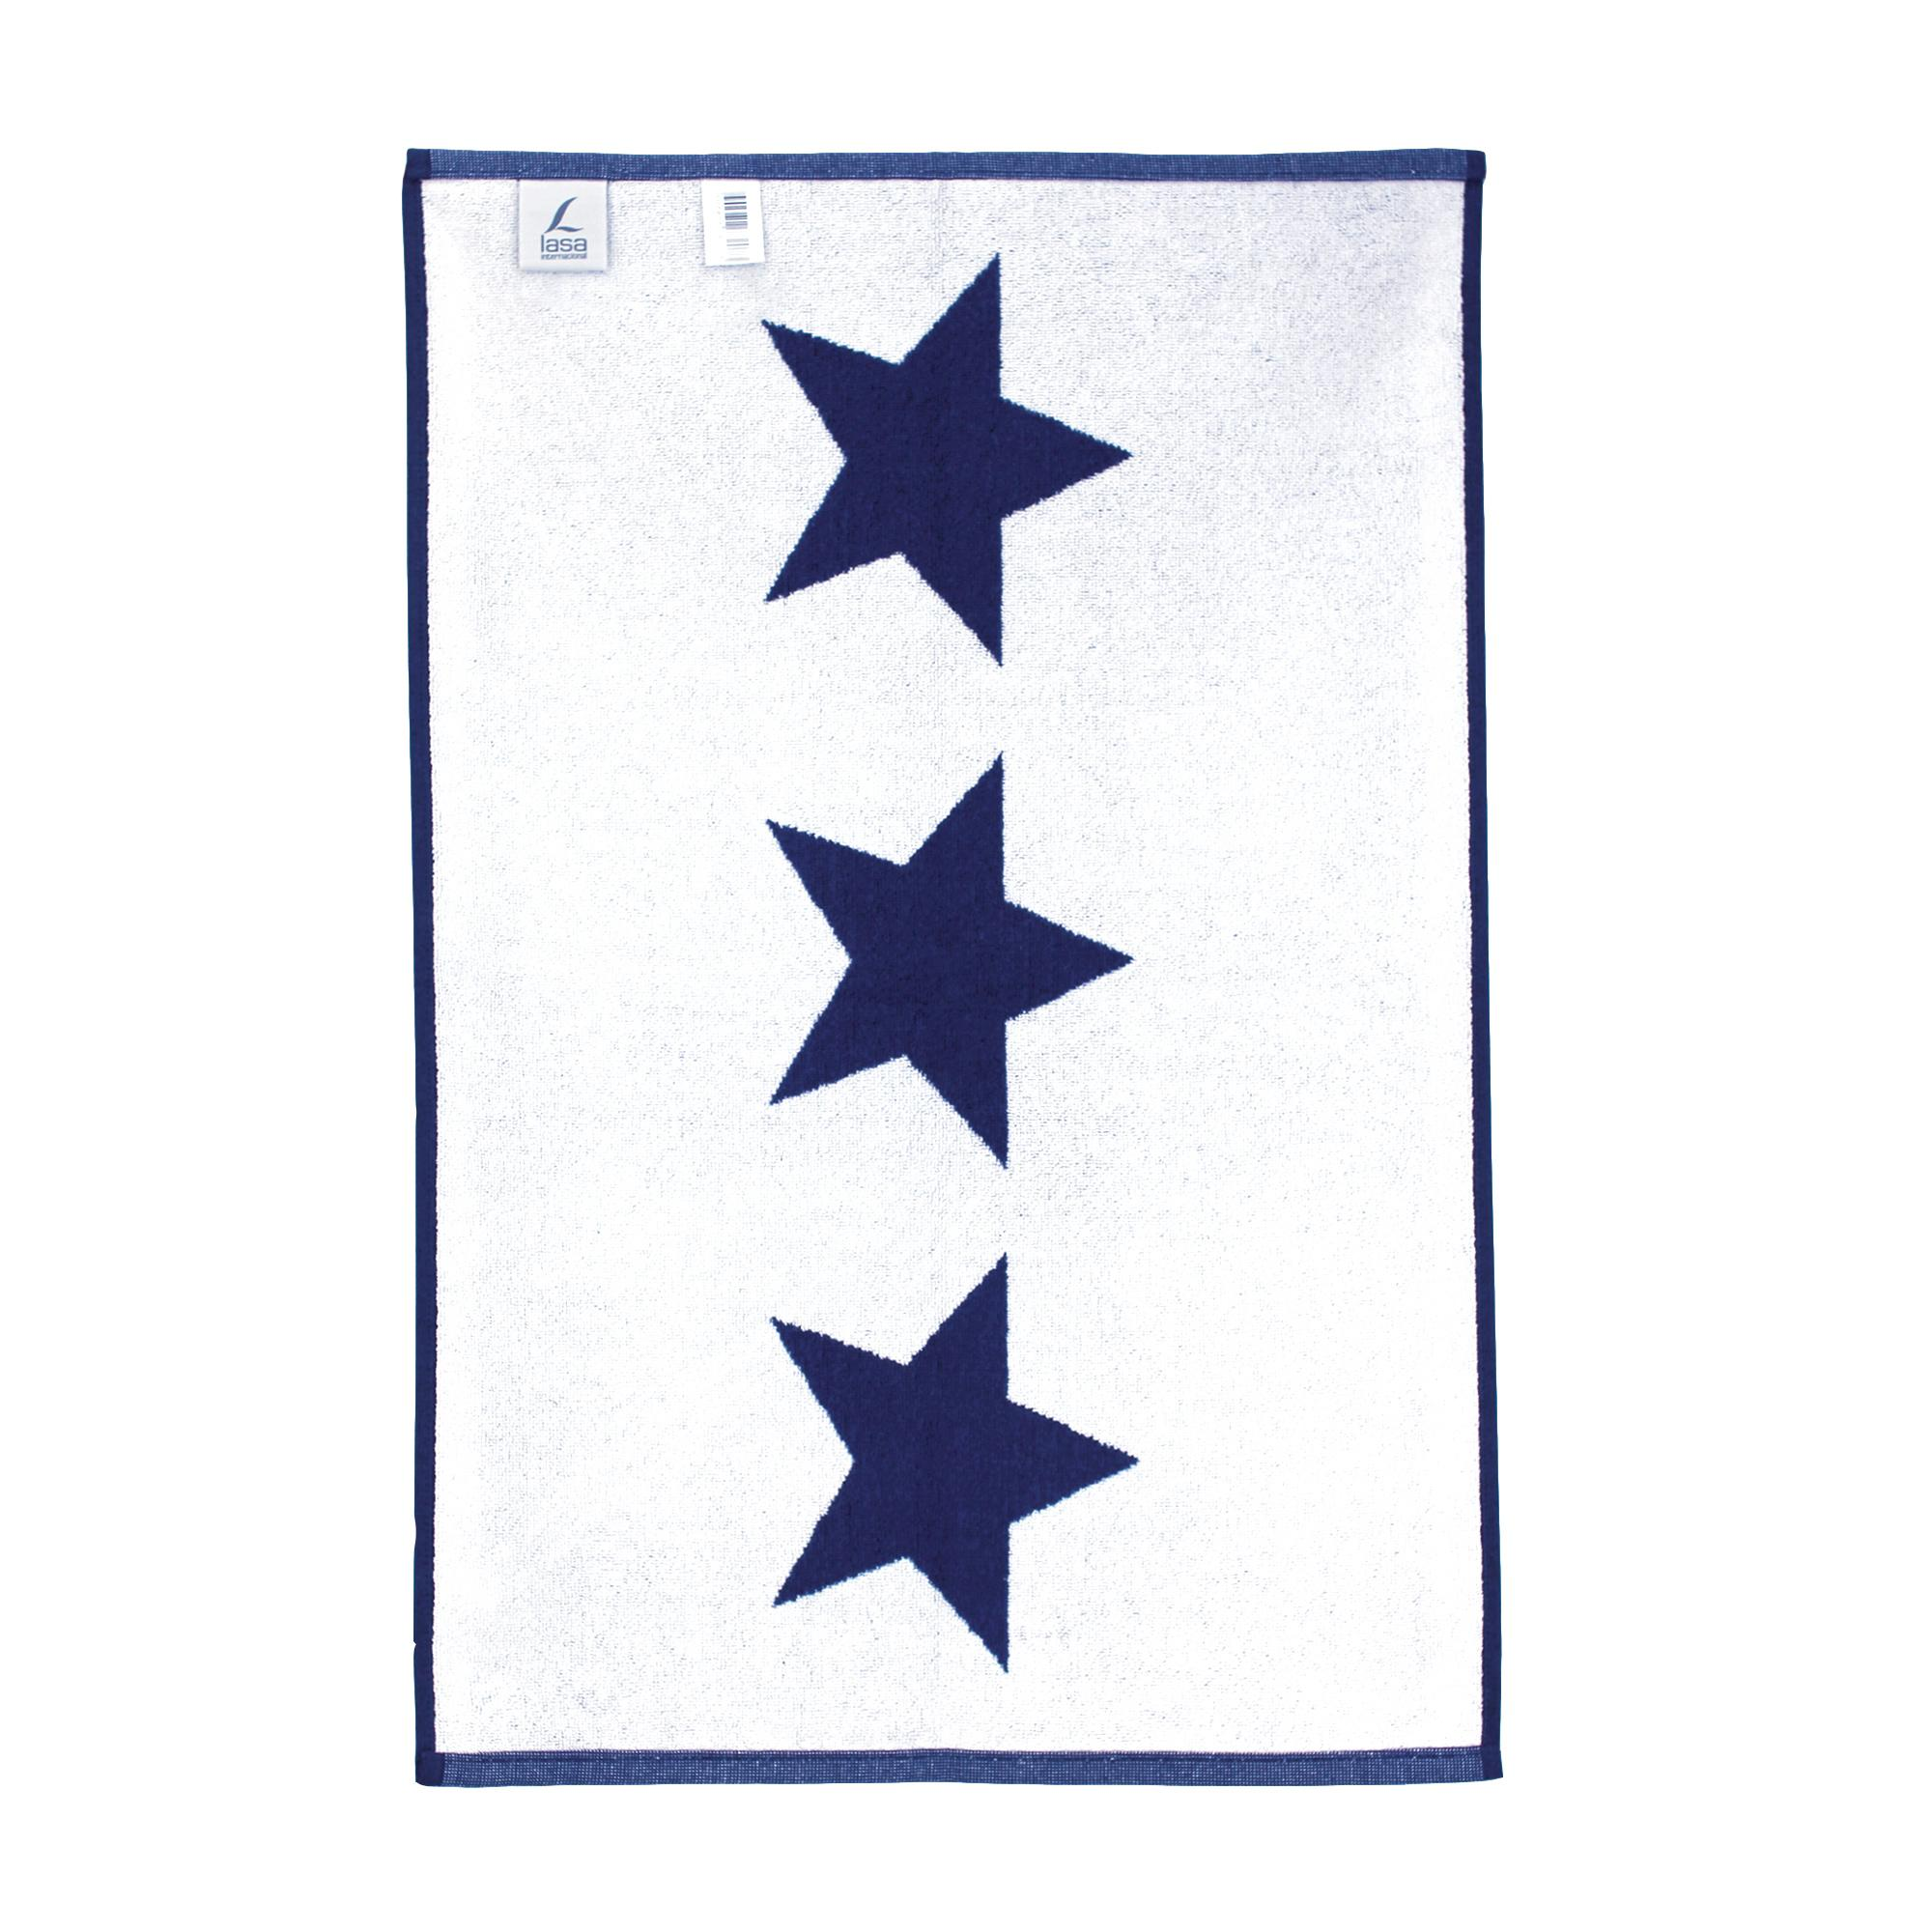 Tapis de bain 50x70 cm coton stars bleu marine linnea - Tapis salle de bain bleu marine ...